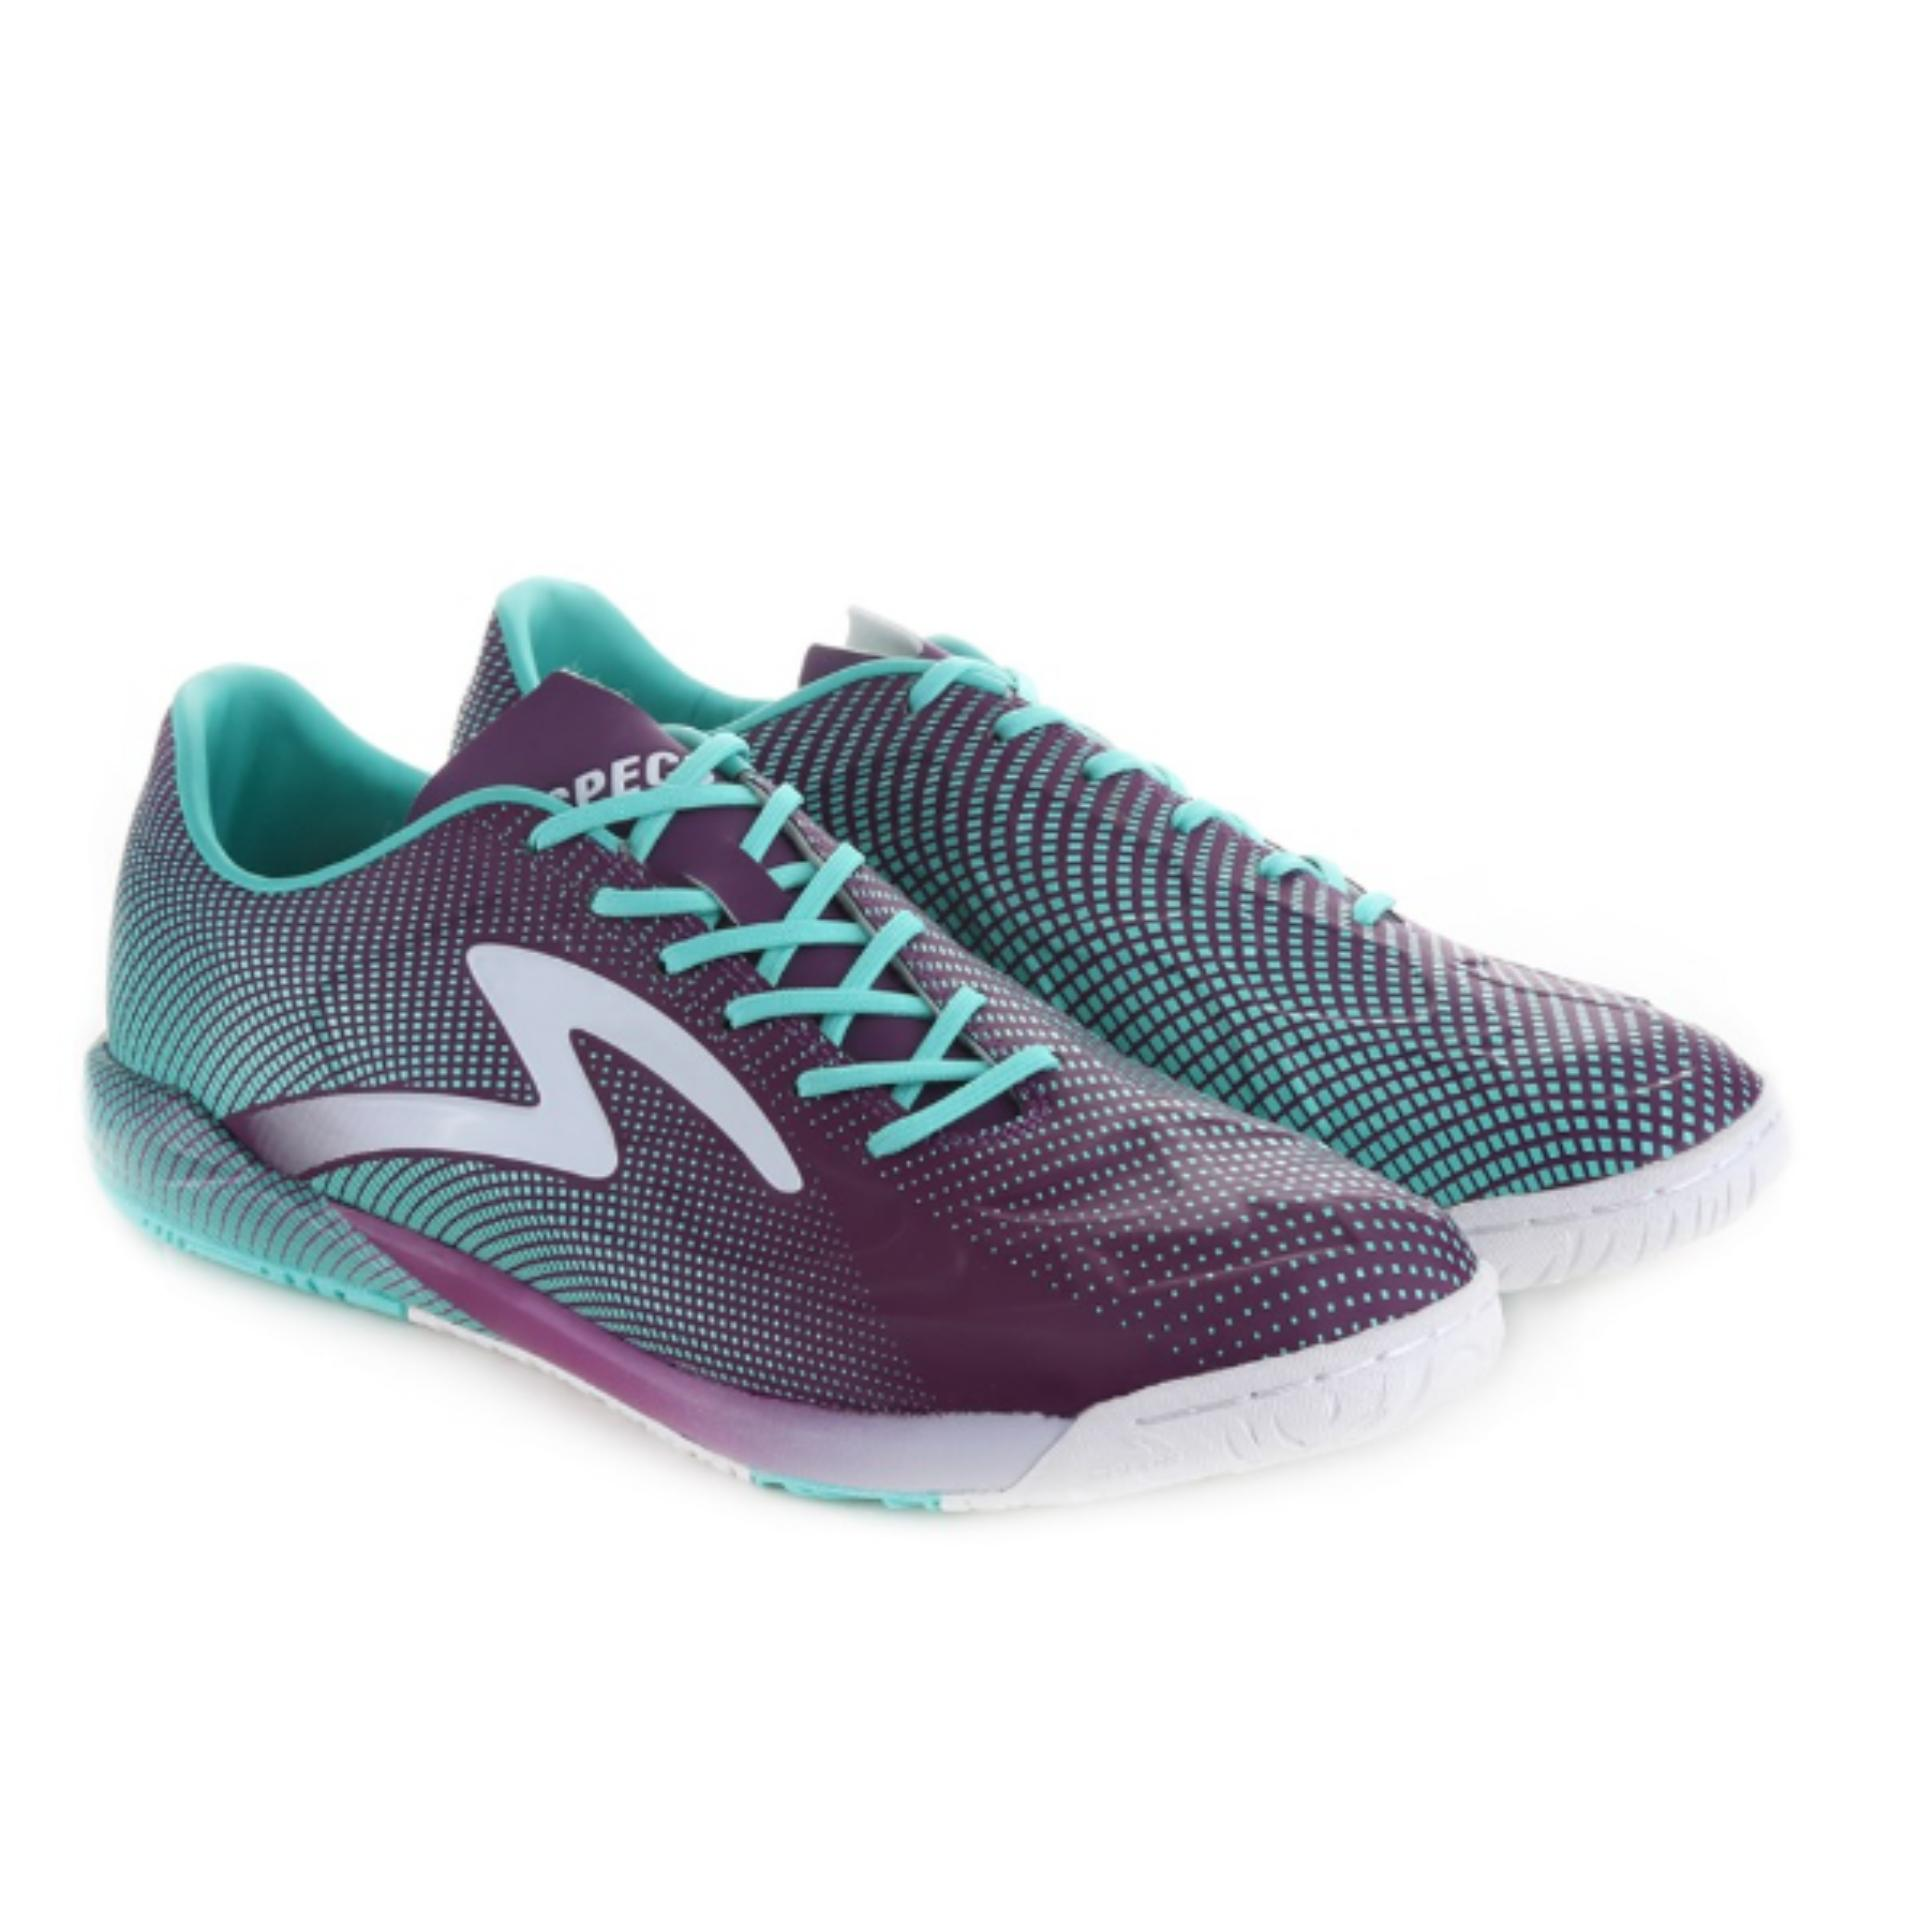 ... Specs Swervo Thunderbolt In Dark Currant Riviera White | Sepatu Futsal ...